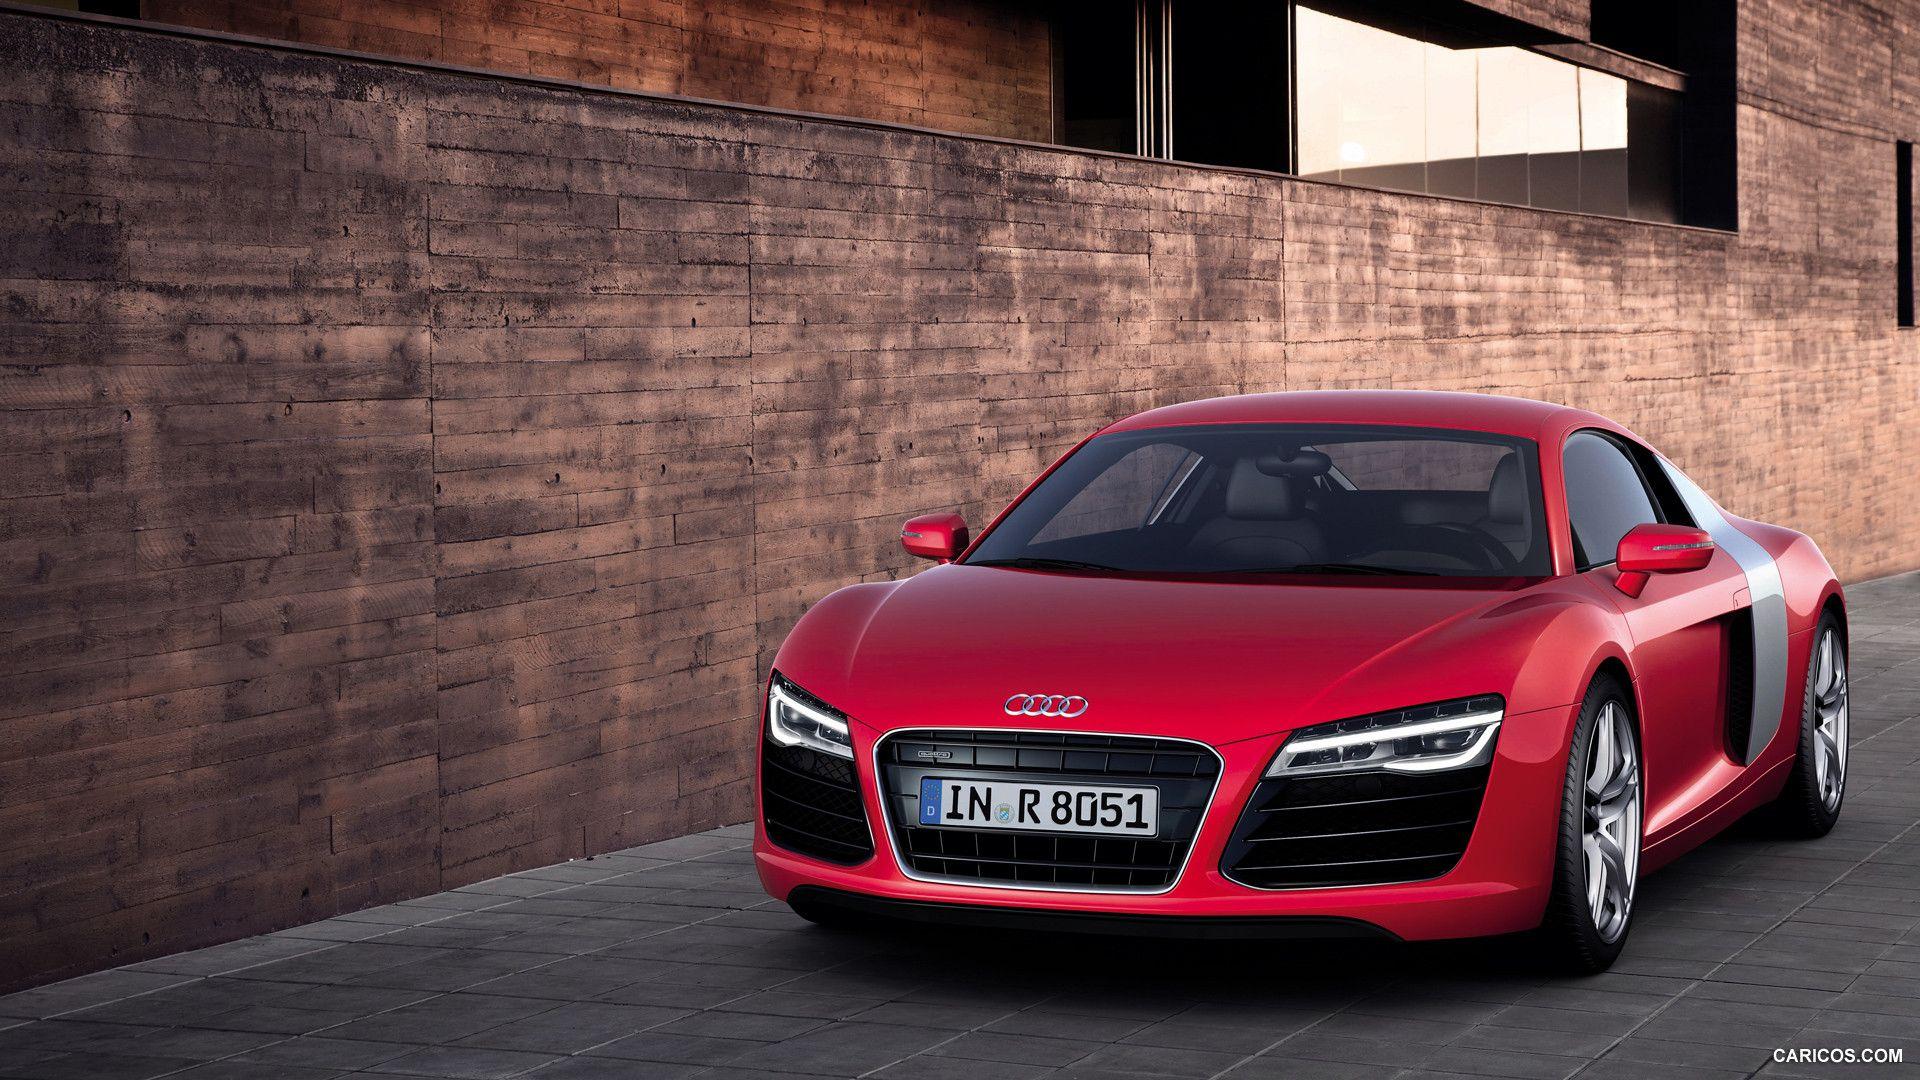 Pin By Anisha Lutchman On One Day Audi Audi R8 Sports Cars Luxury